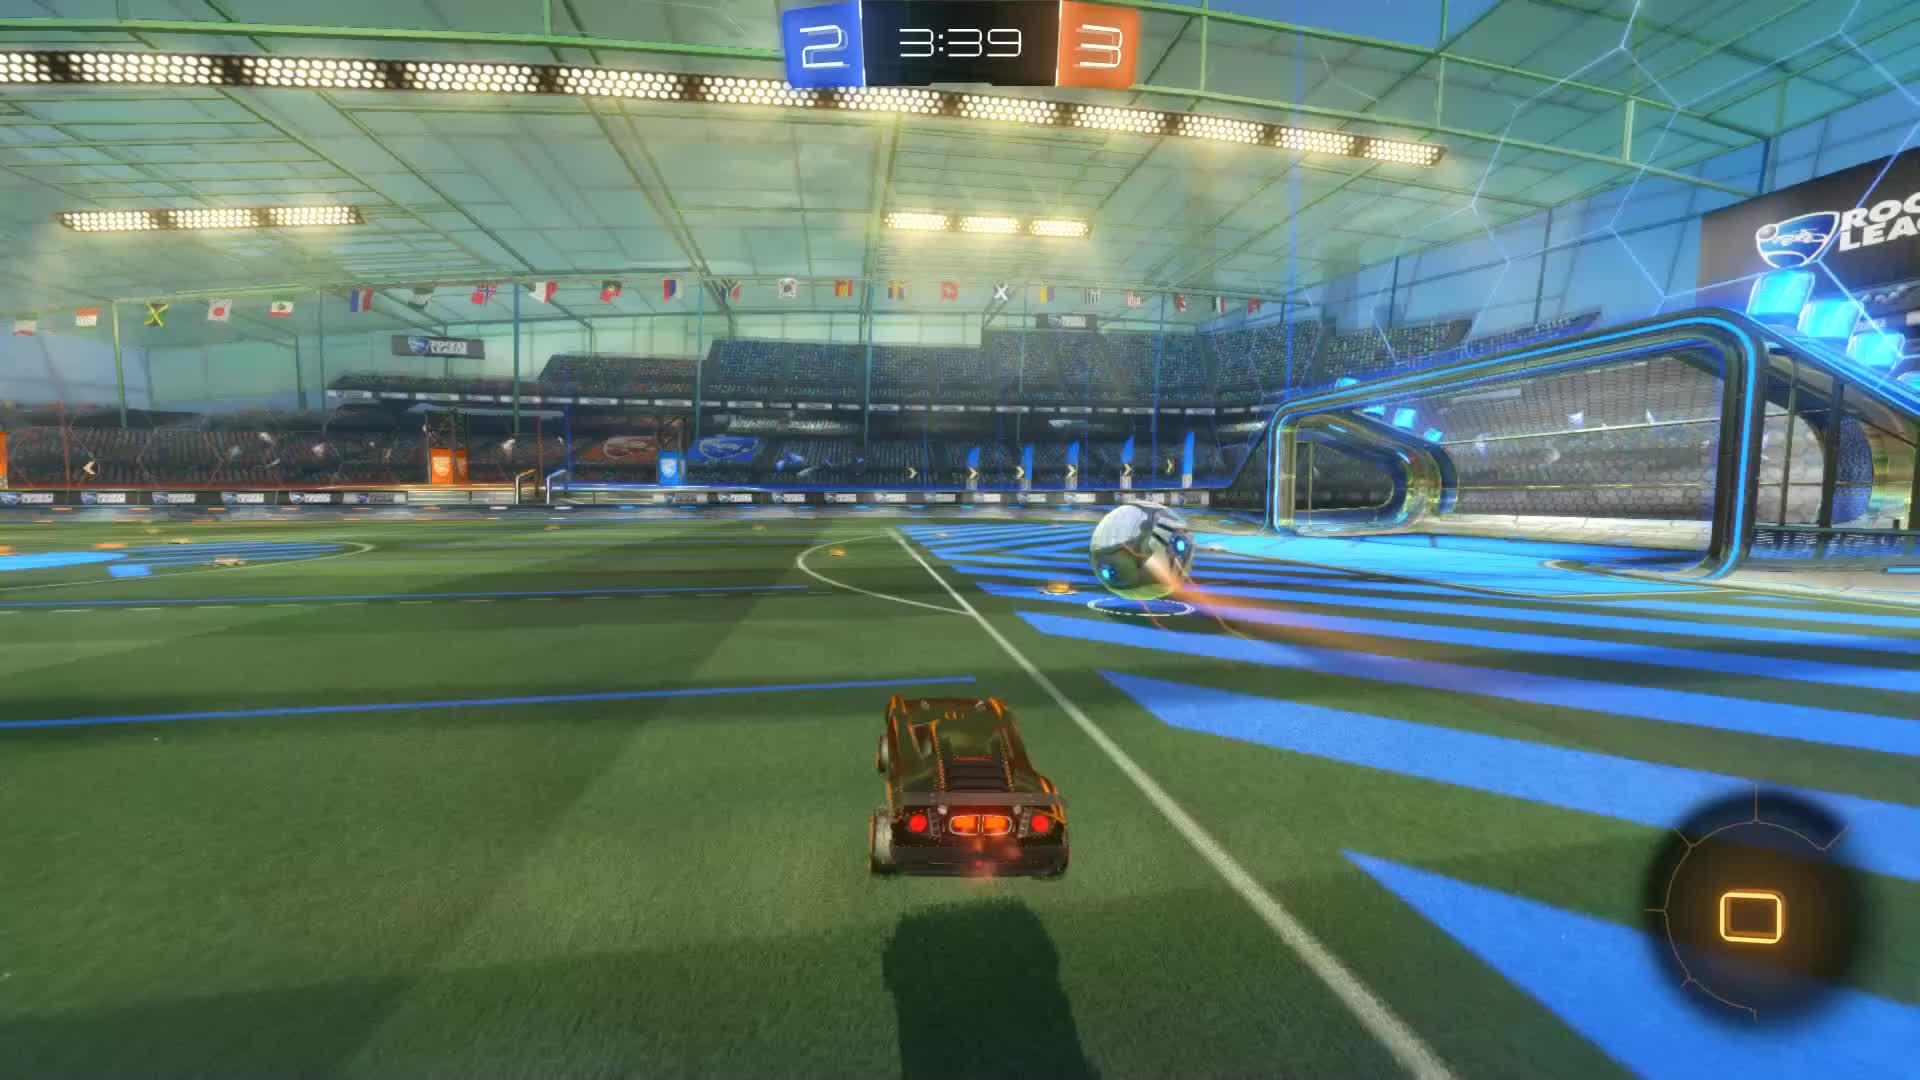 Gif Your Game, GifYourGame, Goal, Rocket League, RocketLeague, Tang, Goal 6: Tang GIFs